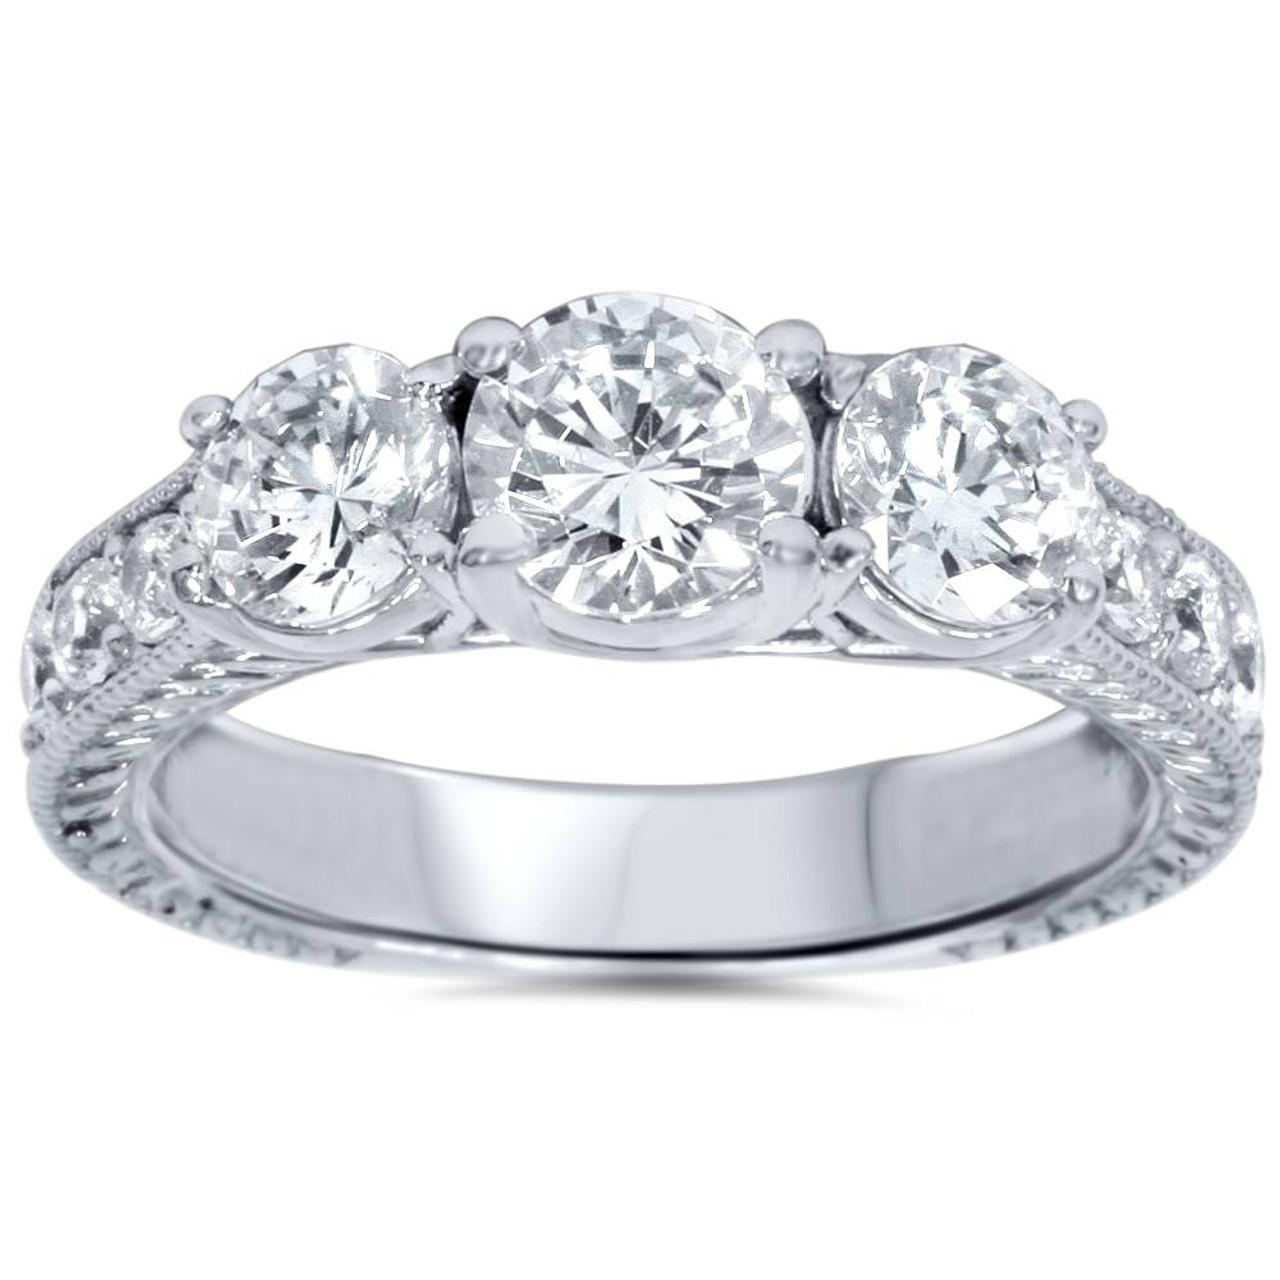 19260f5bce63e 2ct Vintage Three Stone Round Diamond Engagement Ring 14K White Gold (H, I3)